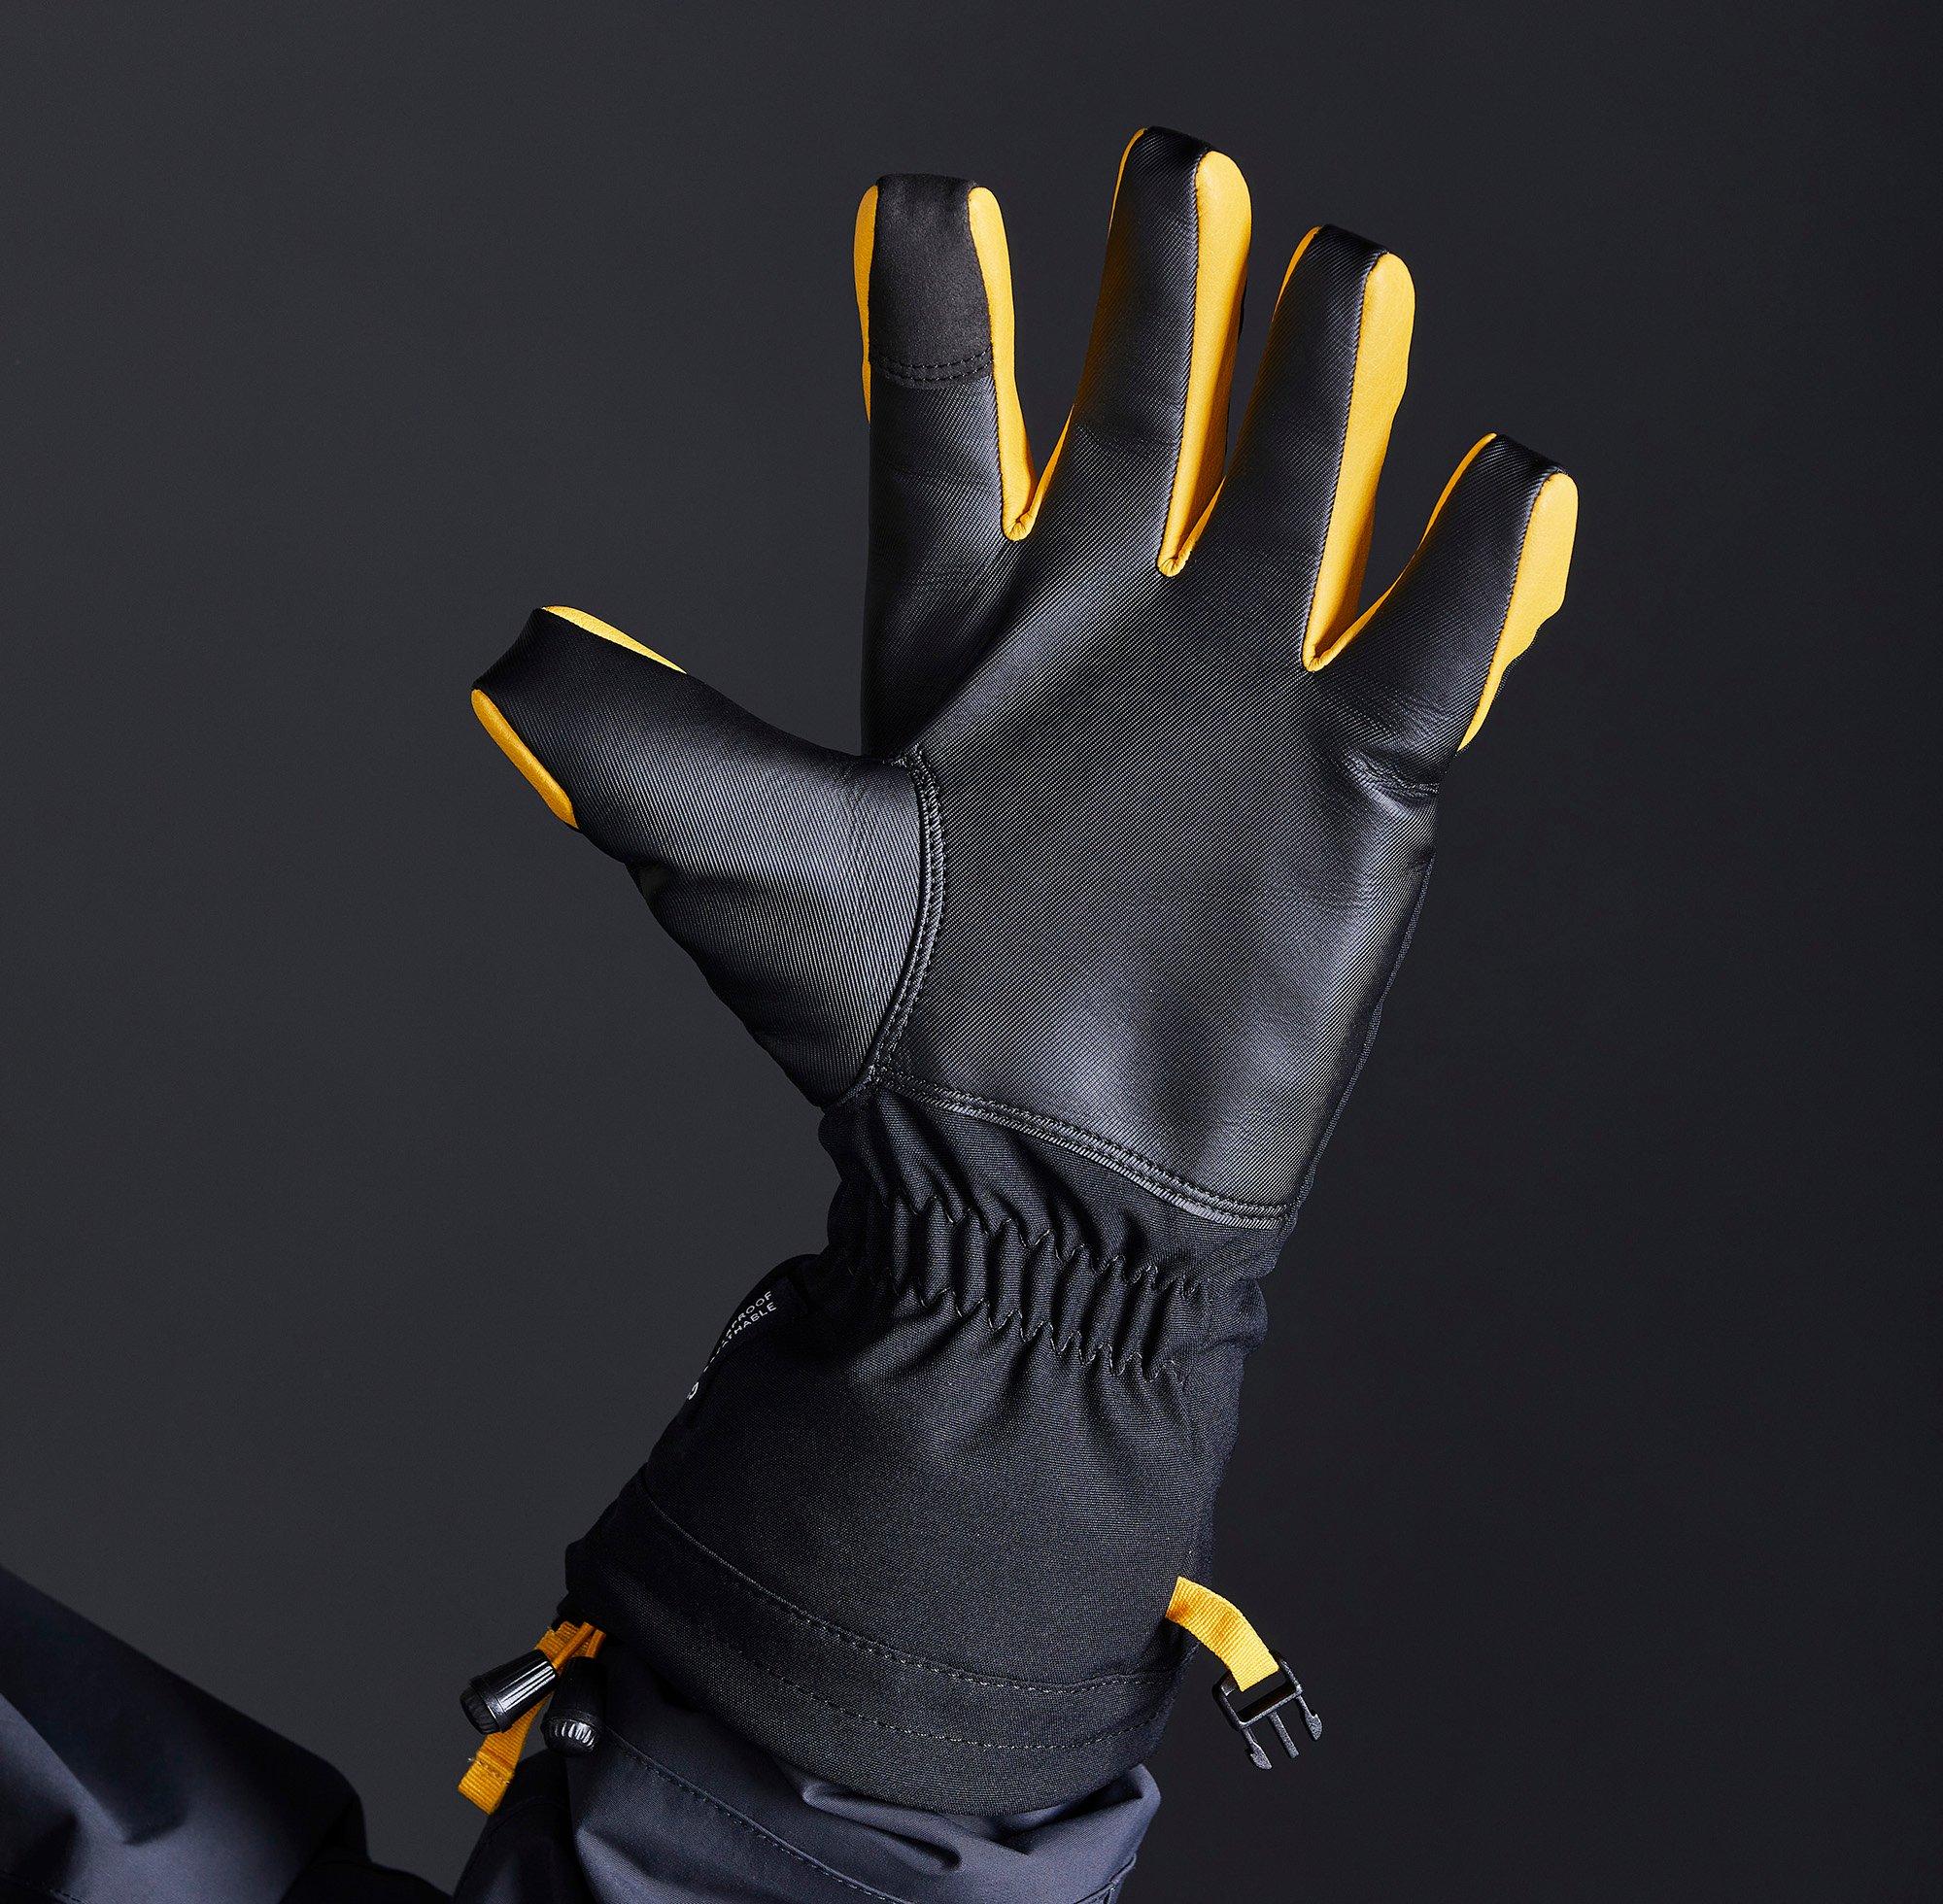 Helmsman-Handschuhe - 7805-BLK01-MODEL_2.jpg